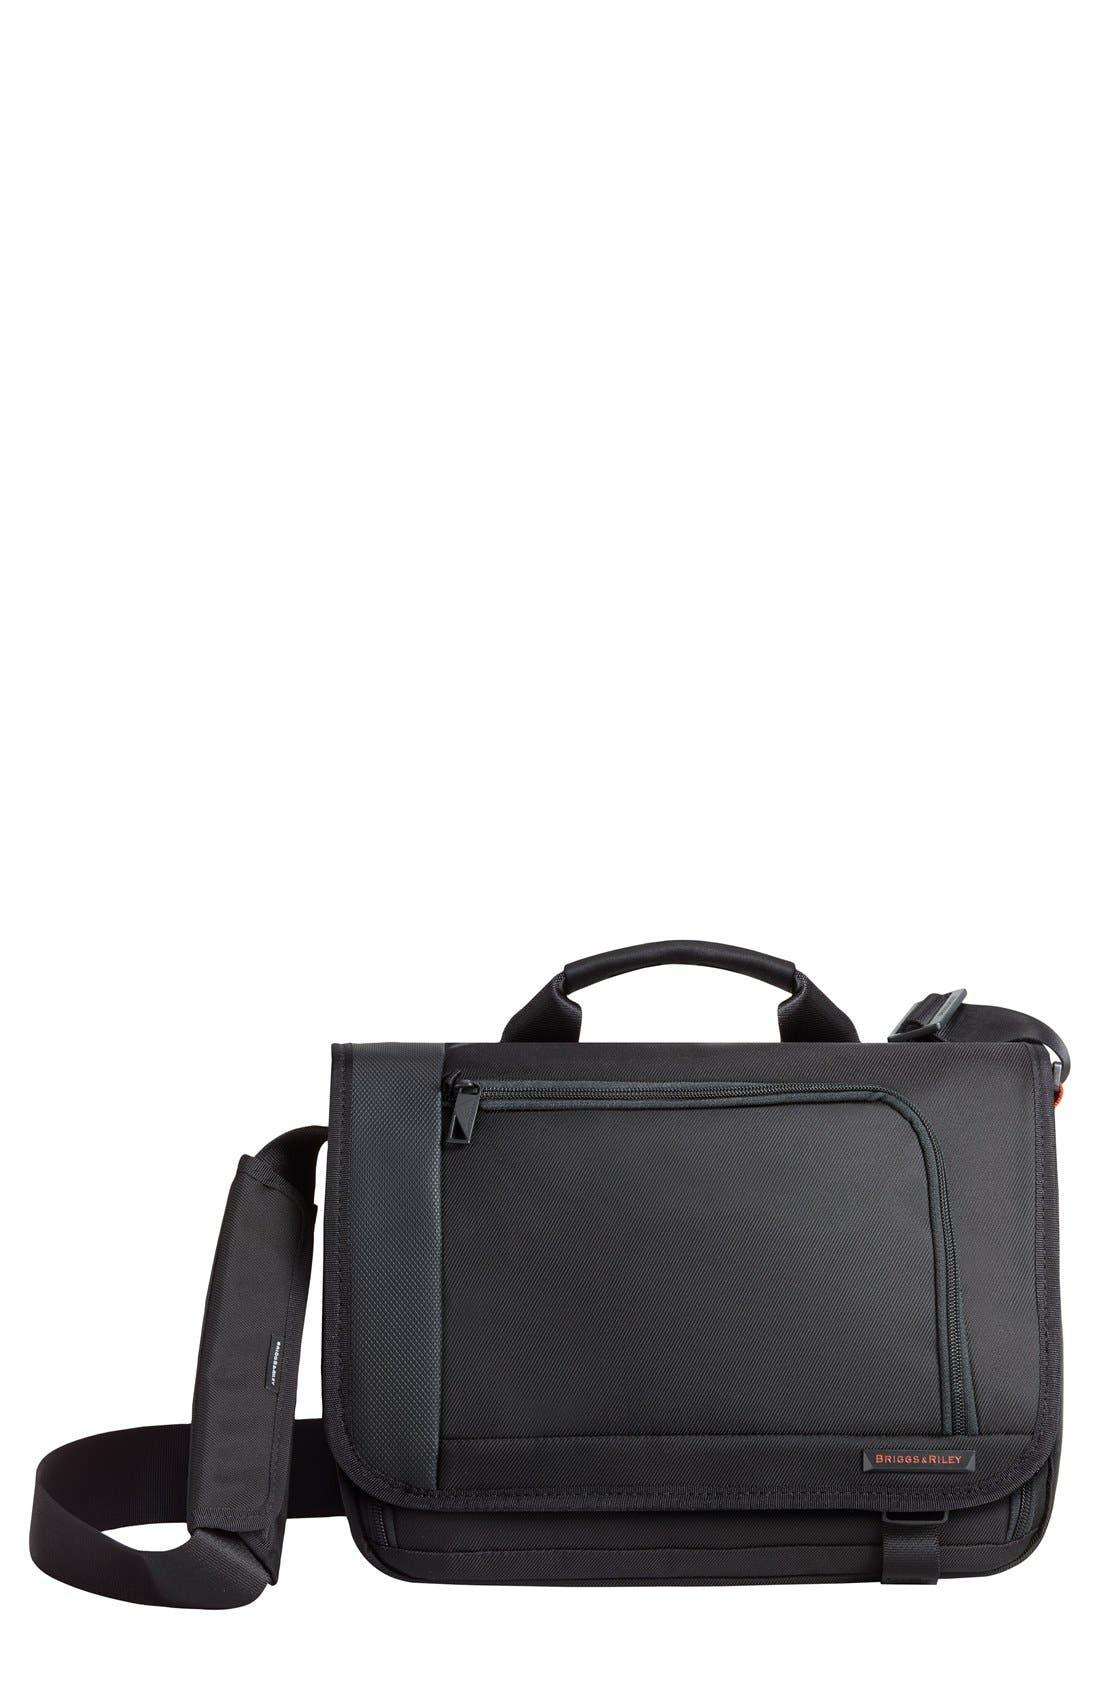 BRIGGS & RILEY 'Verb - Instant' Messenger Bag